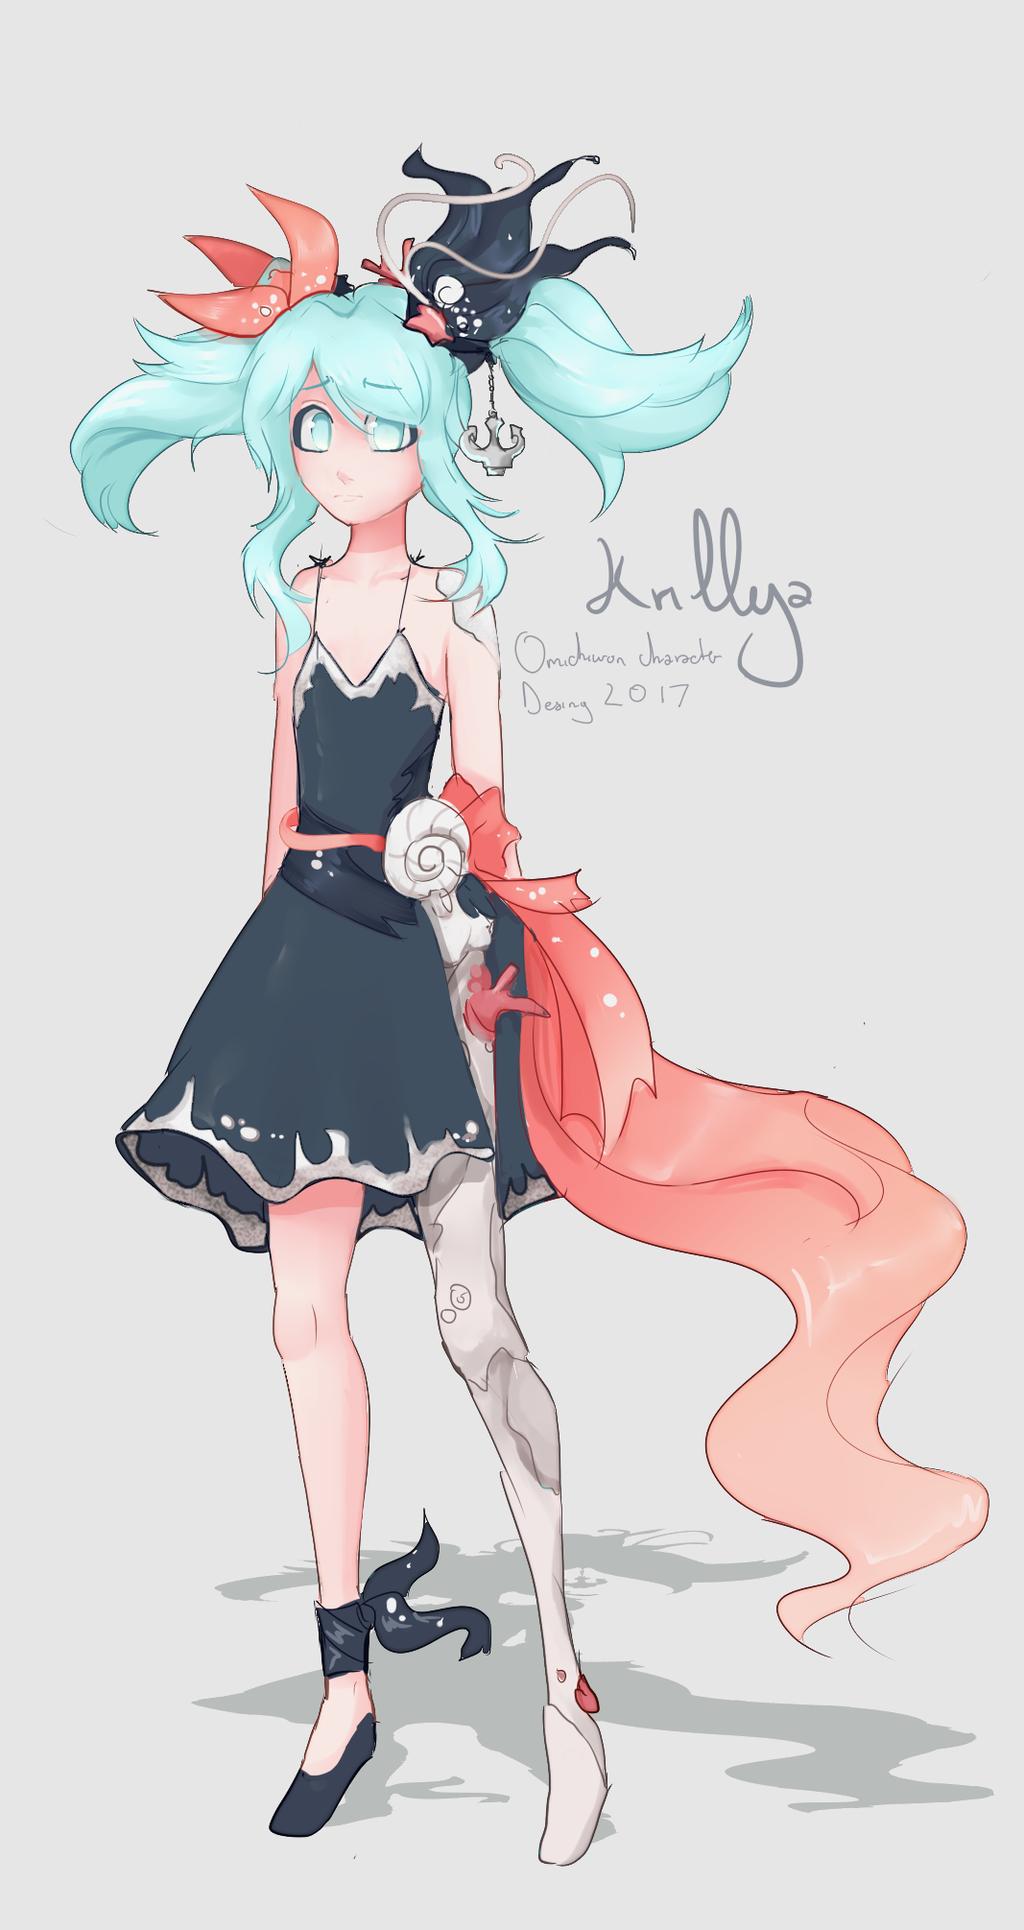 Character Design Oc : Krillya oc character design by omichiwon on deviantart